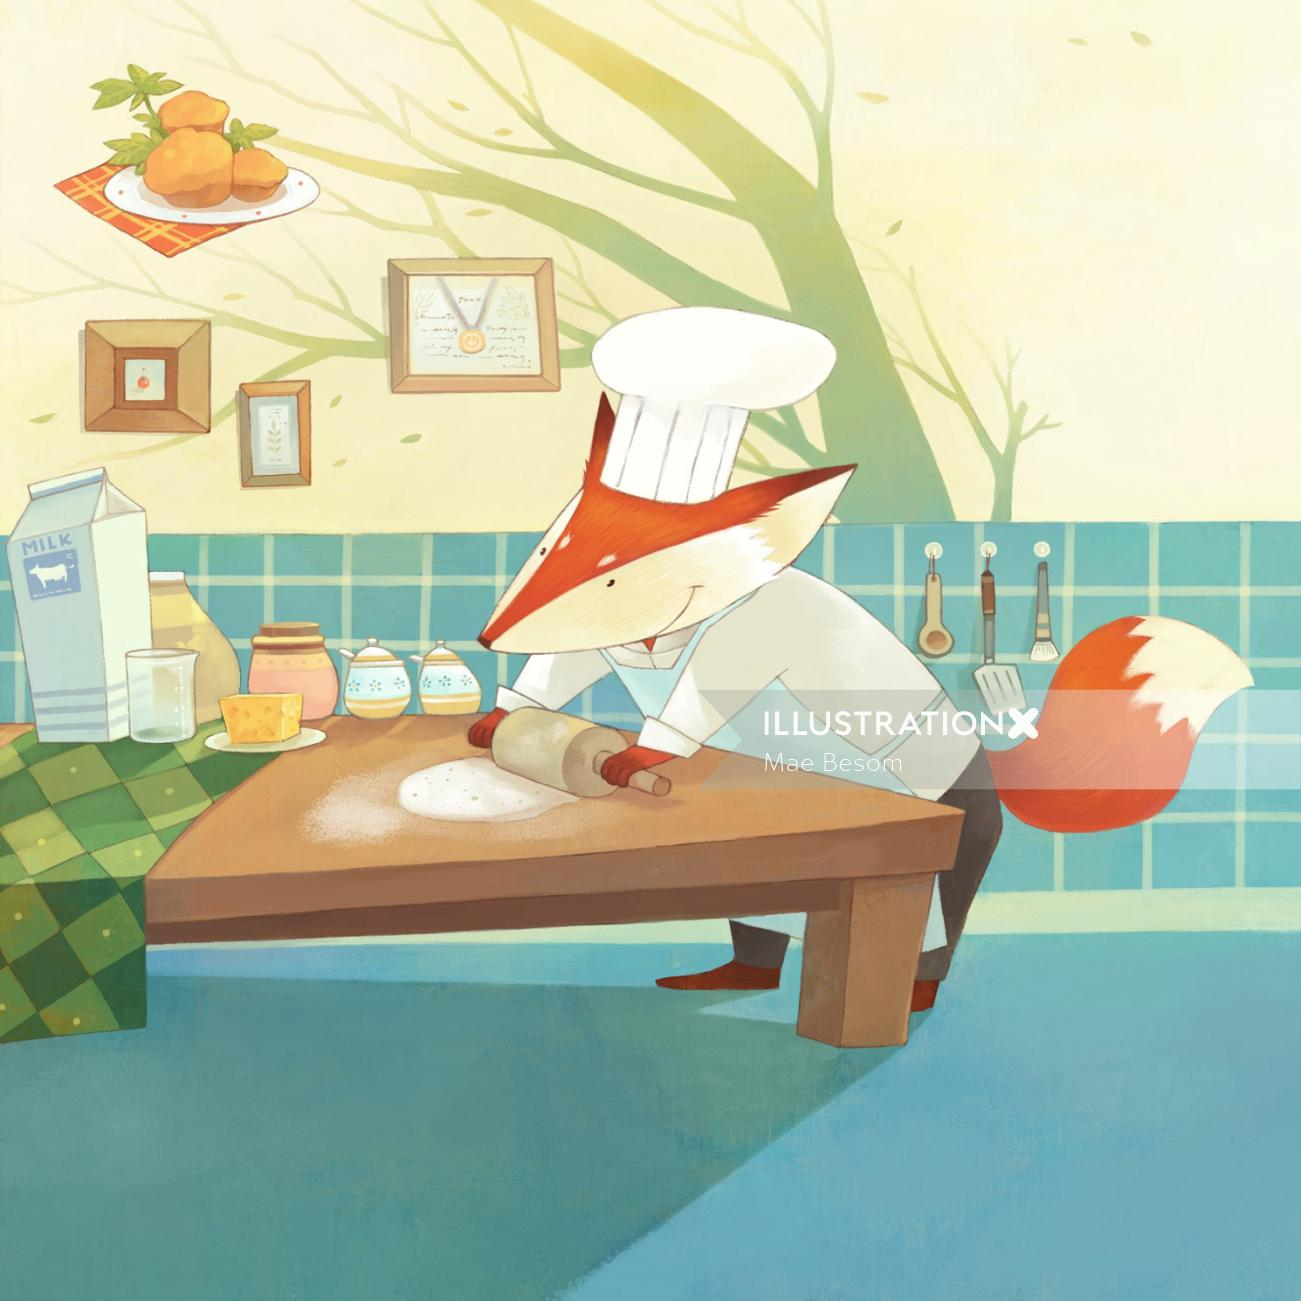 Illustration of chef fox